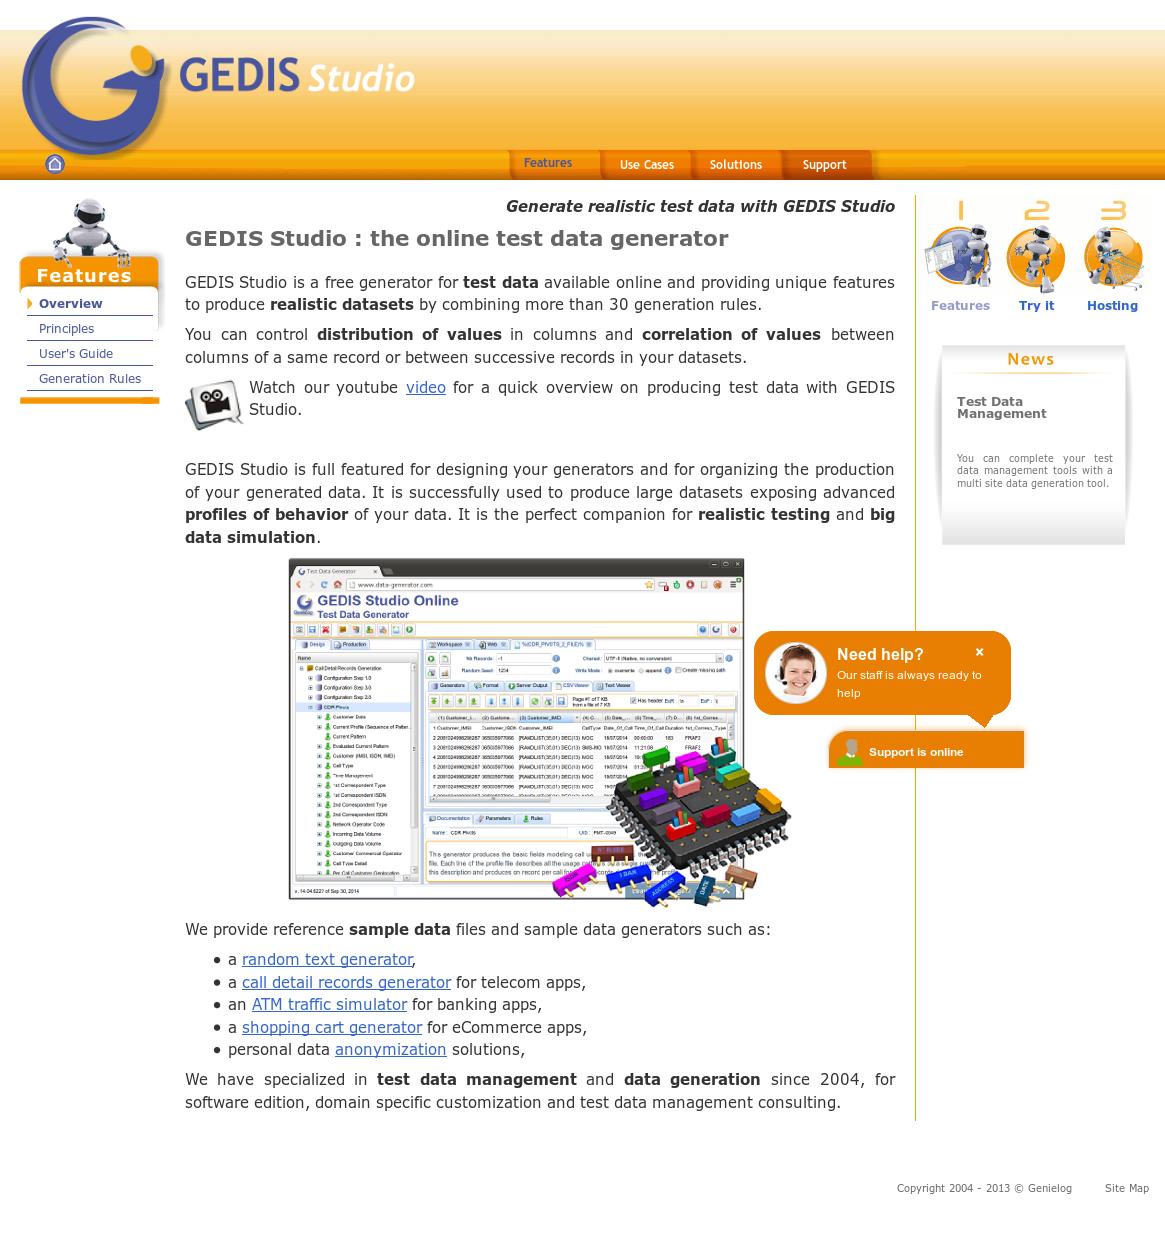 Gedis Studio Competitors, Revenue and Employees - Owler